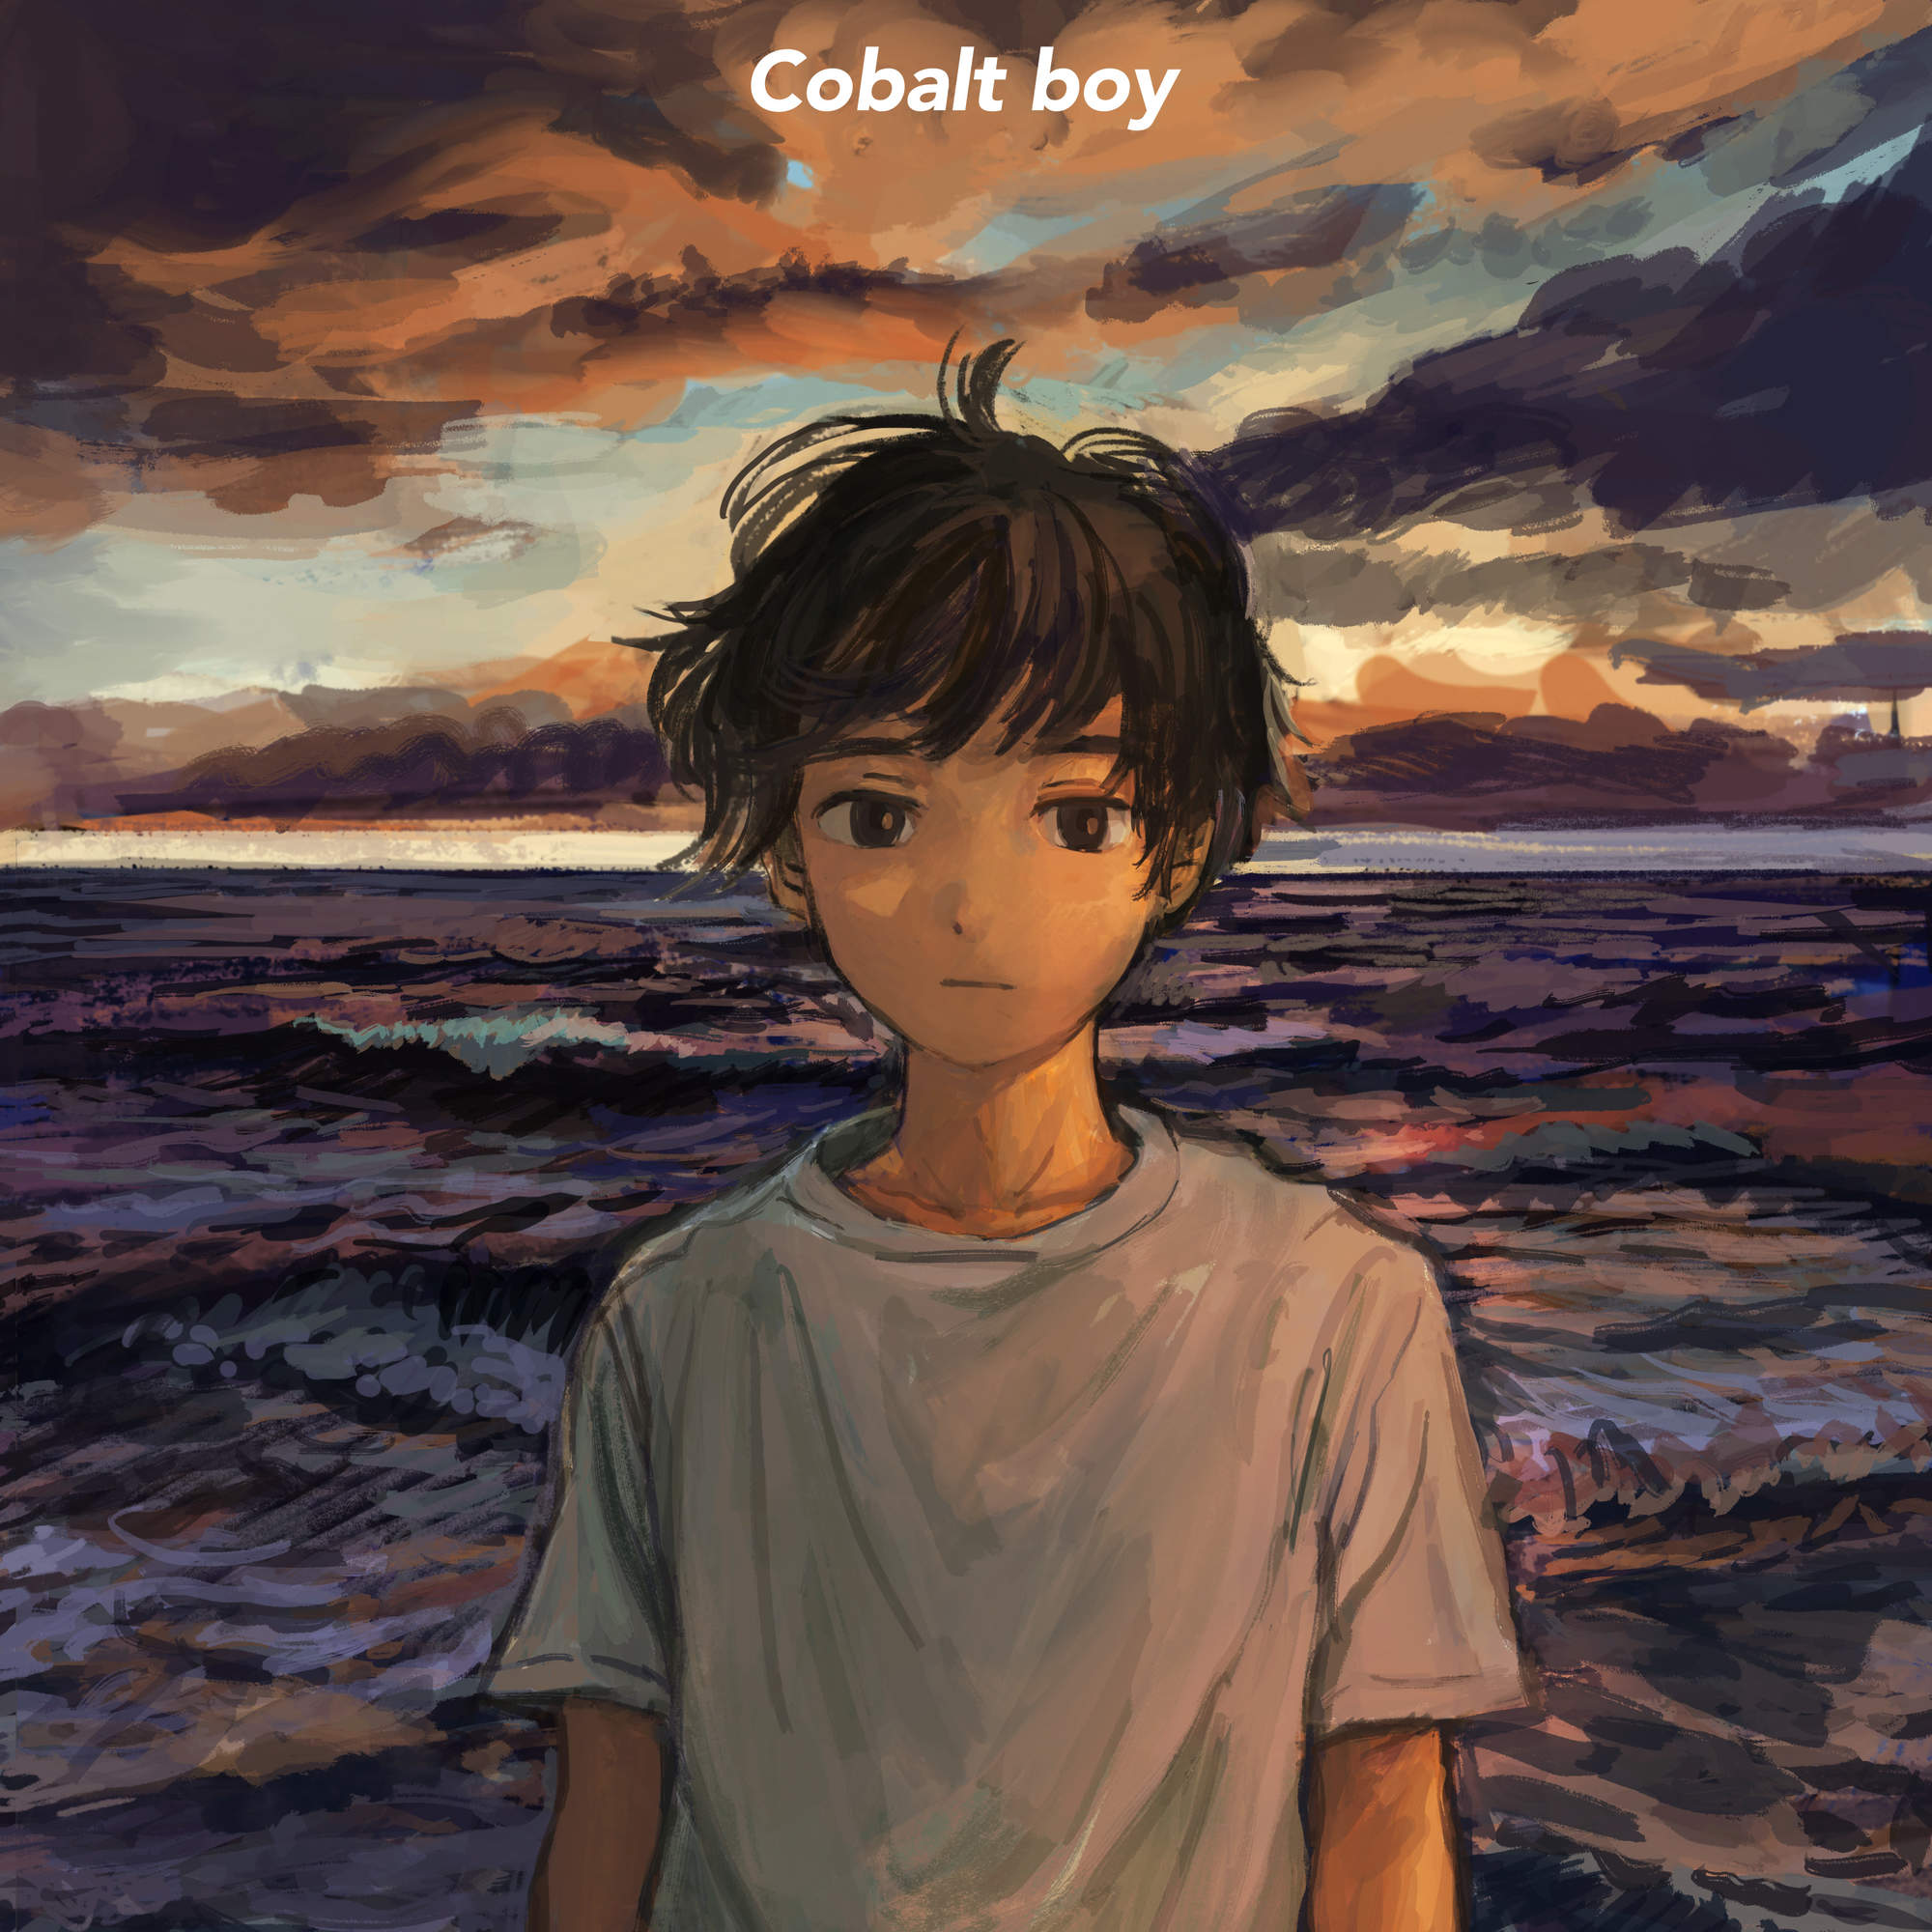 Cobalt boy 1stアルバム『SANSO』本日より配信スタート!限定プレスのCDとLPは9月29日リリース!!ROSE通販部ではただ今よりCD、レコードに加え、ジャケットデザインTシャツの予約受付開始!